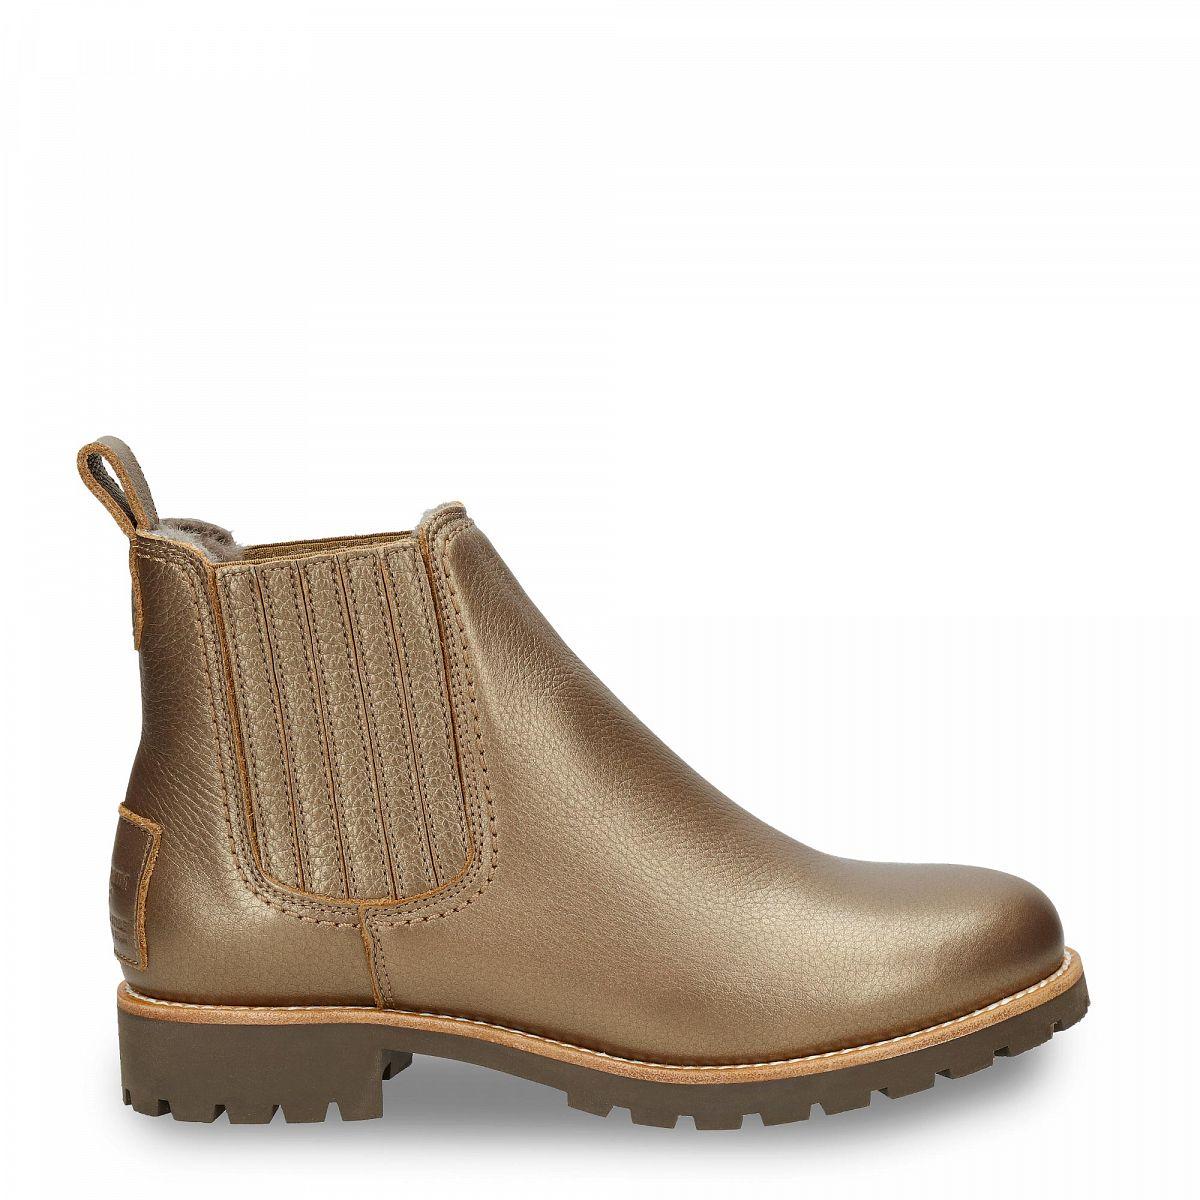 c590324f08ee89 Panama Jack Chelsea Boots – Bildergalerie für Clubbilder